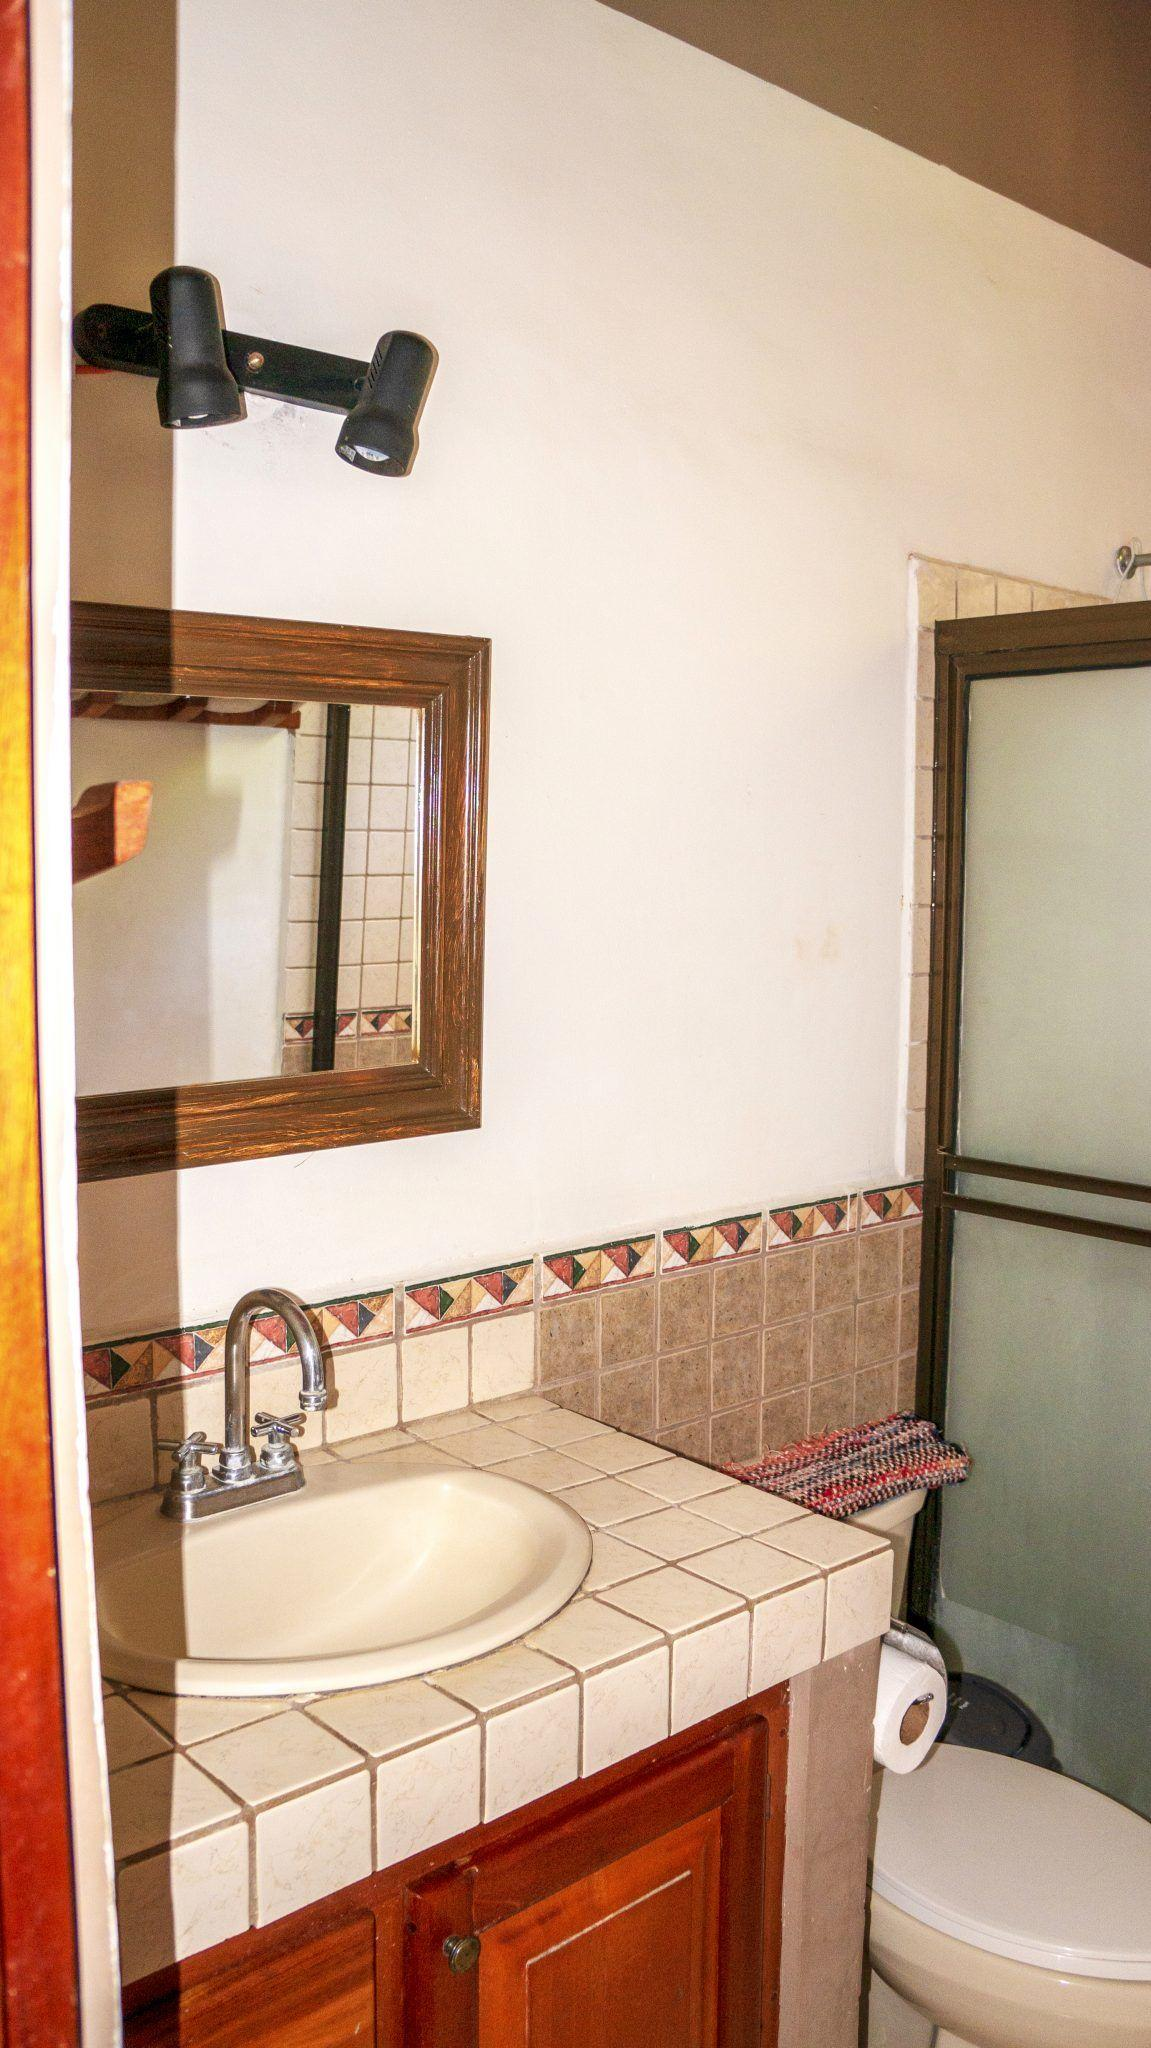 LP2 - Bathroom